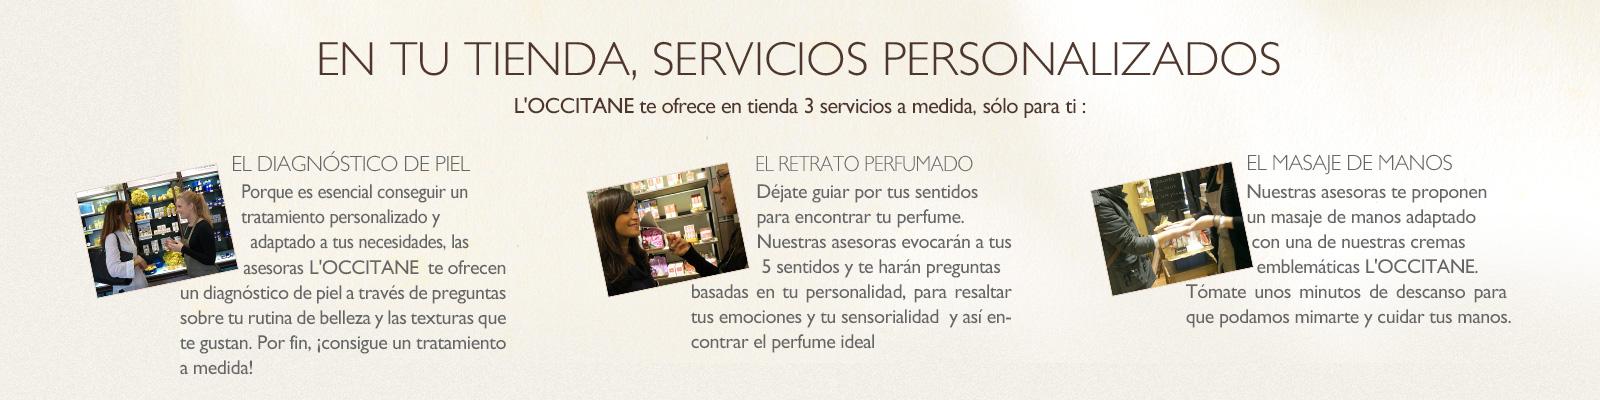 Servicios en tiendas L'Occitane España